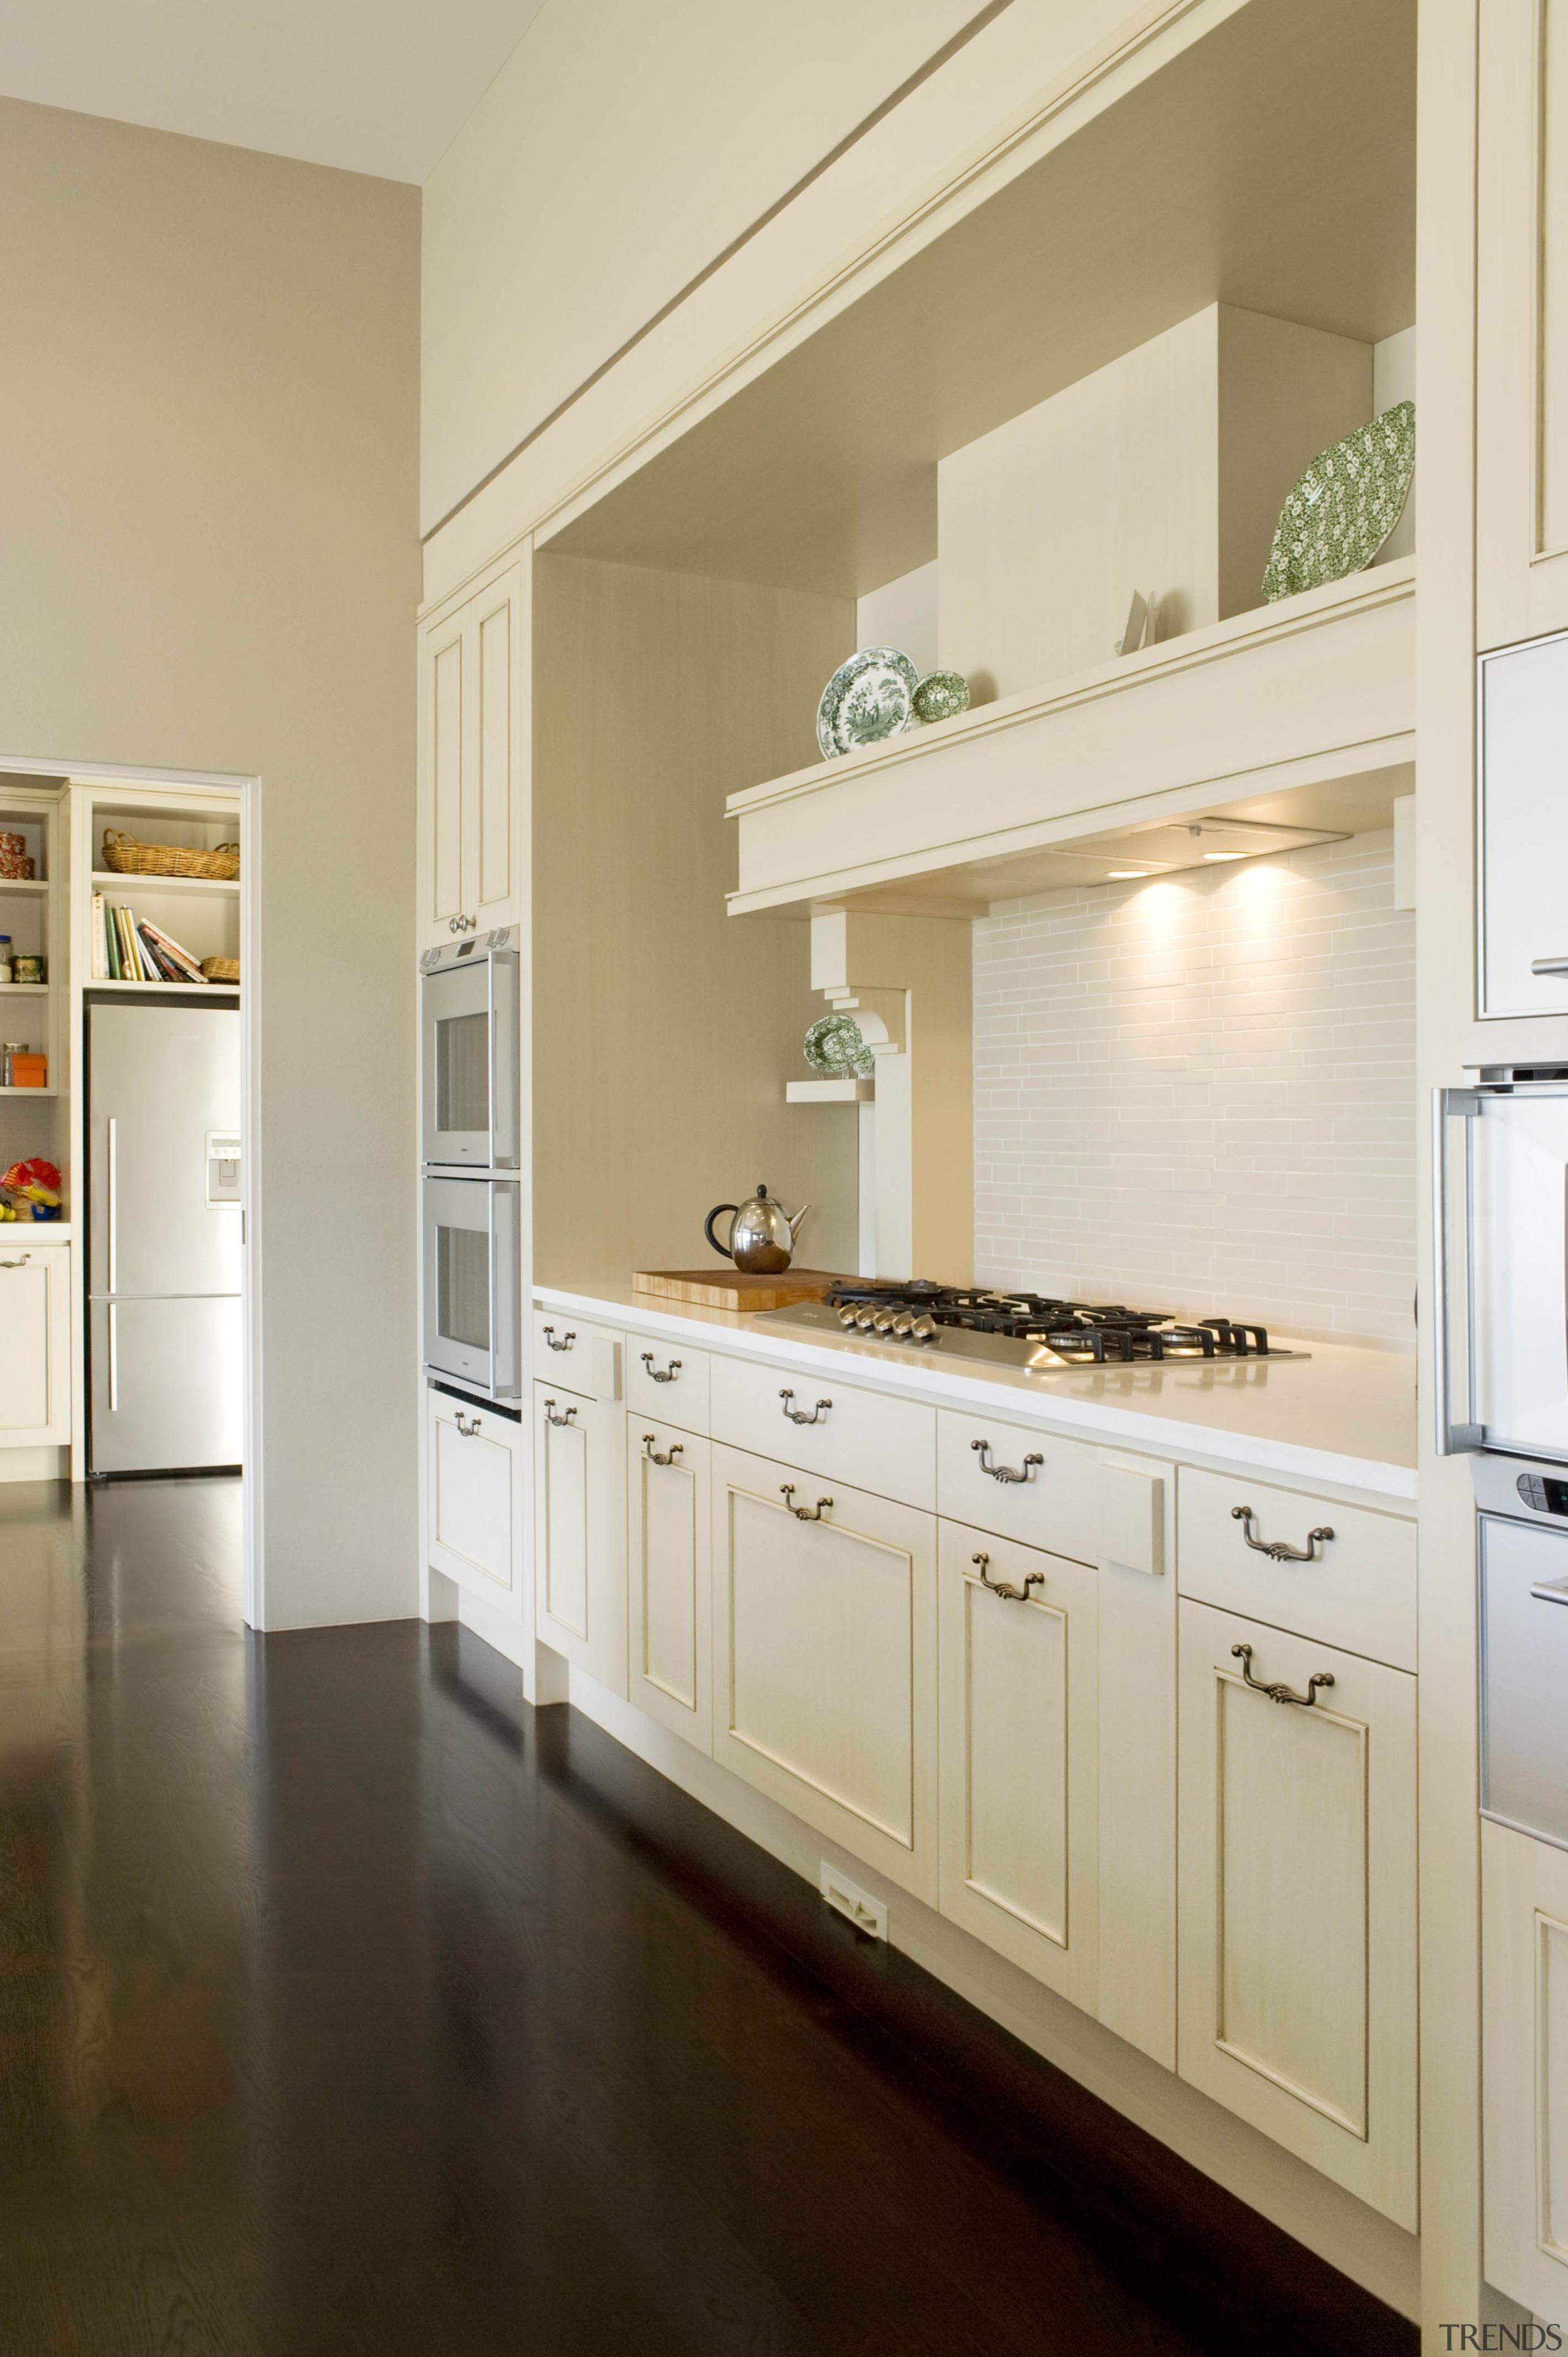 Karaka - cabinetry | countertop | cuisine classique cabinetry, countertop, cuisine classique, floor, home, home appliance, interior design, kitchen, room, gray, brown